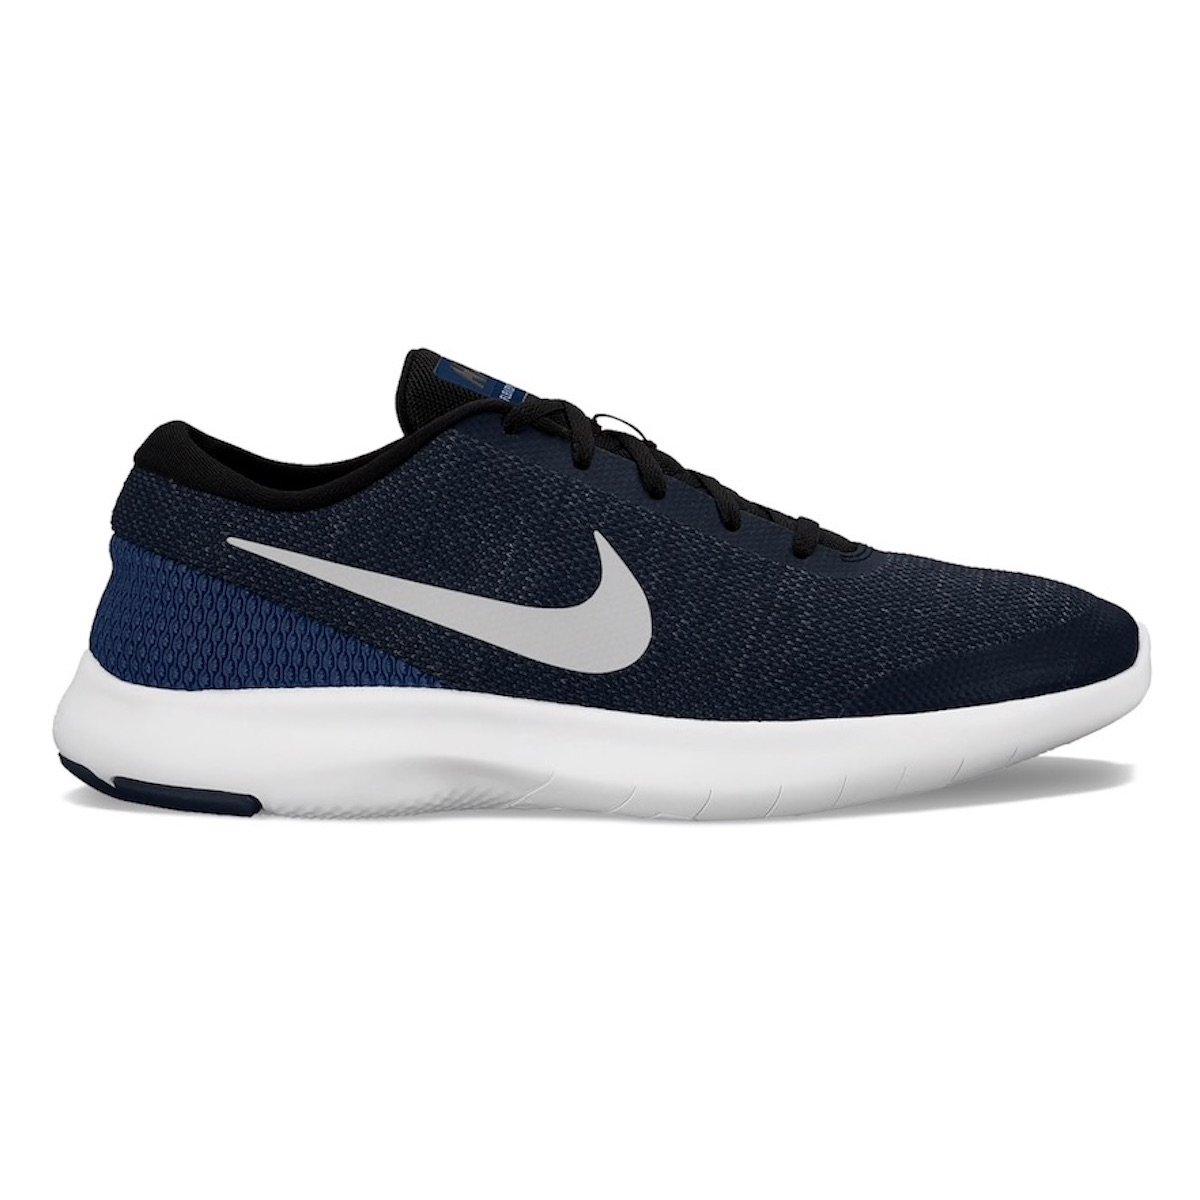 6b23fc778977 Galleon - NIKE Men s Flex Experience Rn 7 Running Shoes (11 D(M) US ...